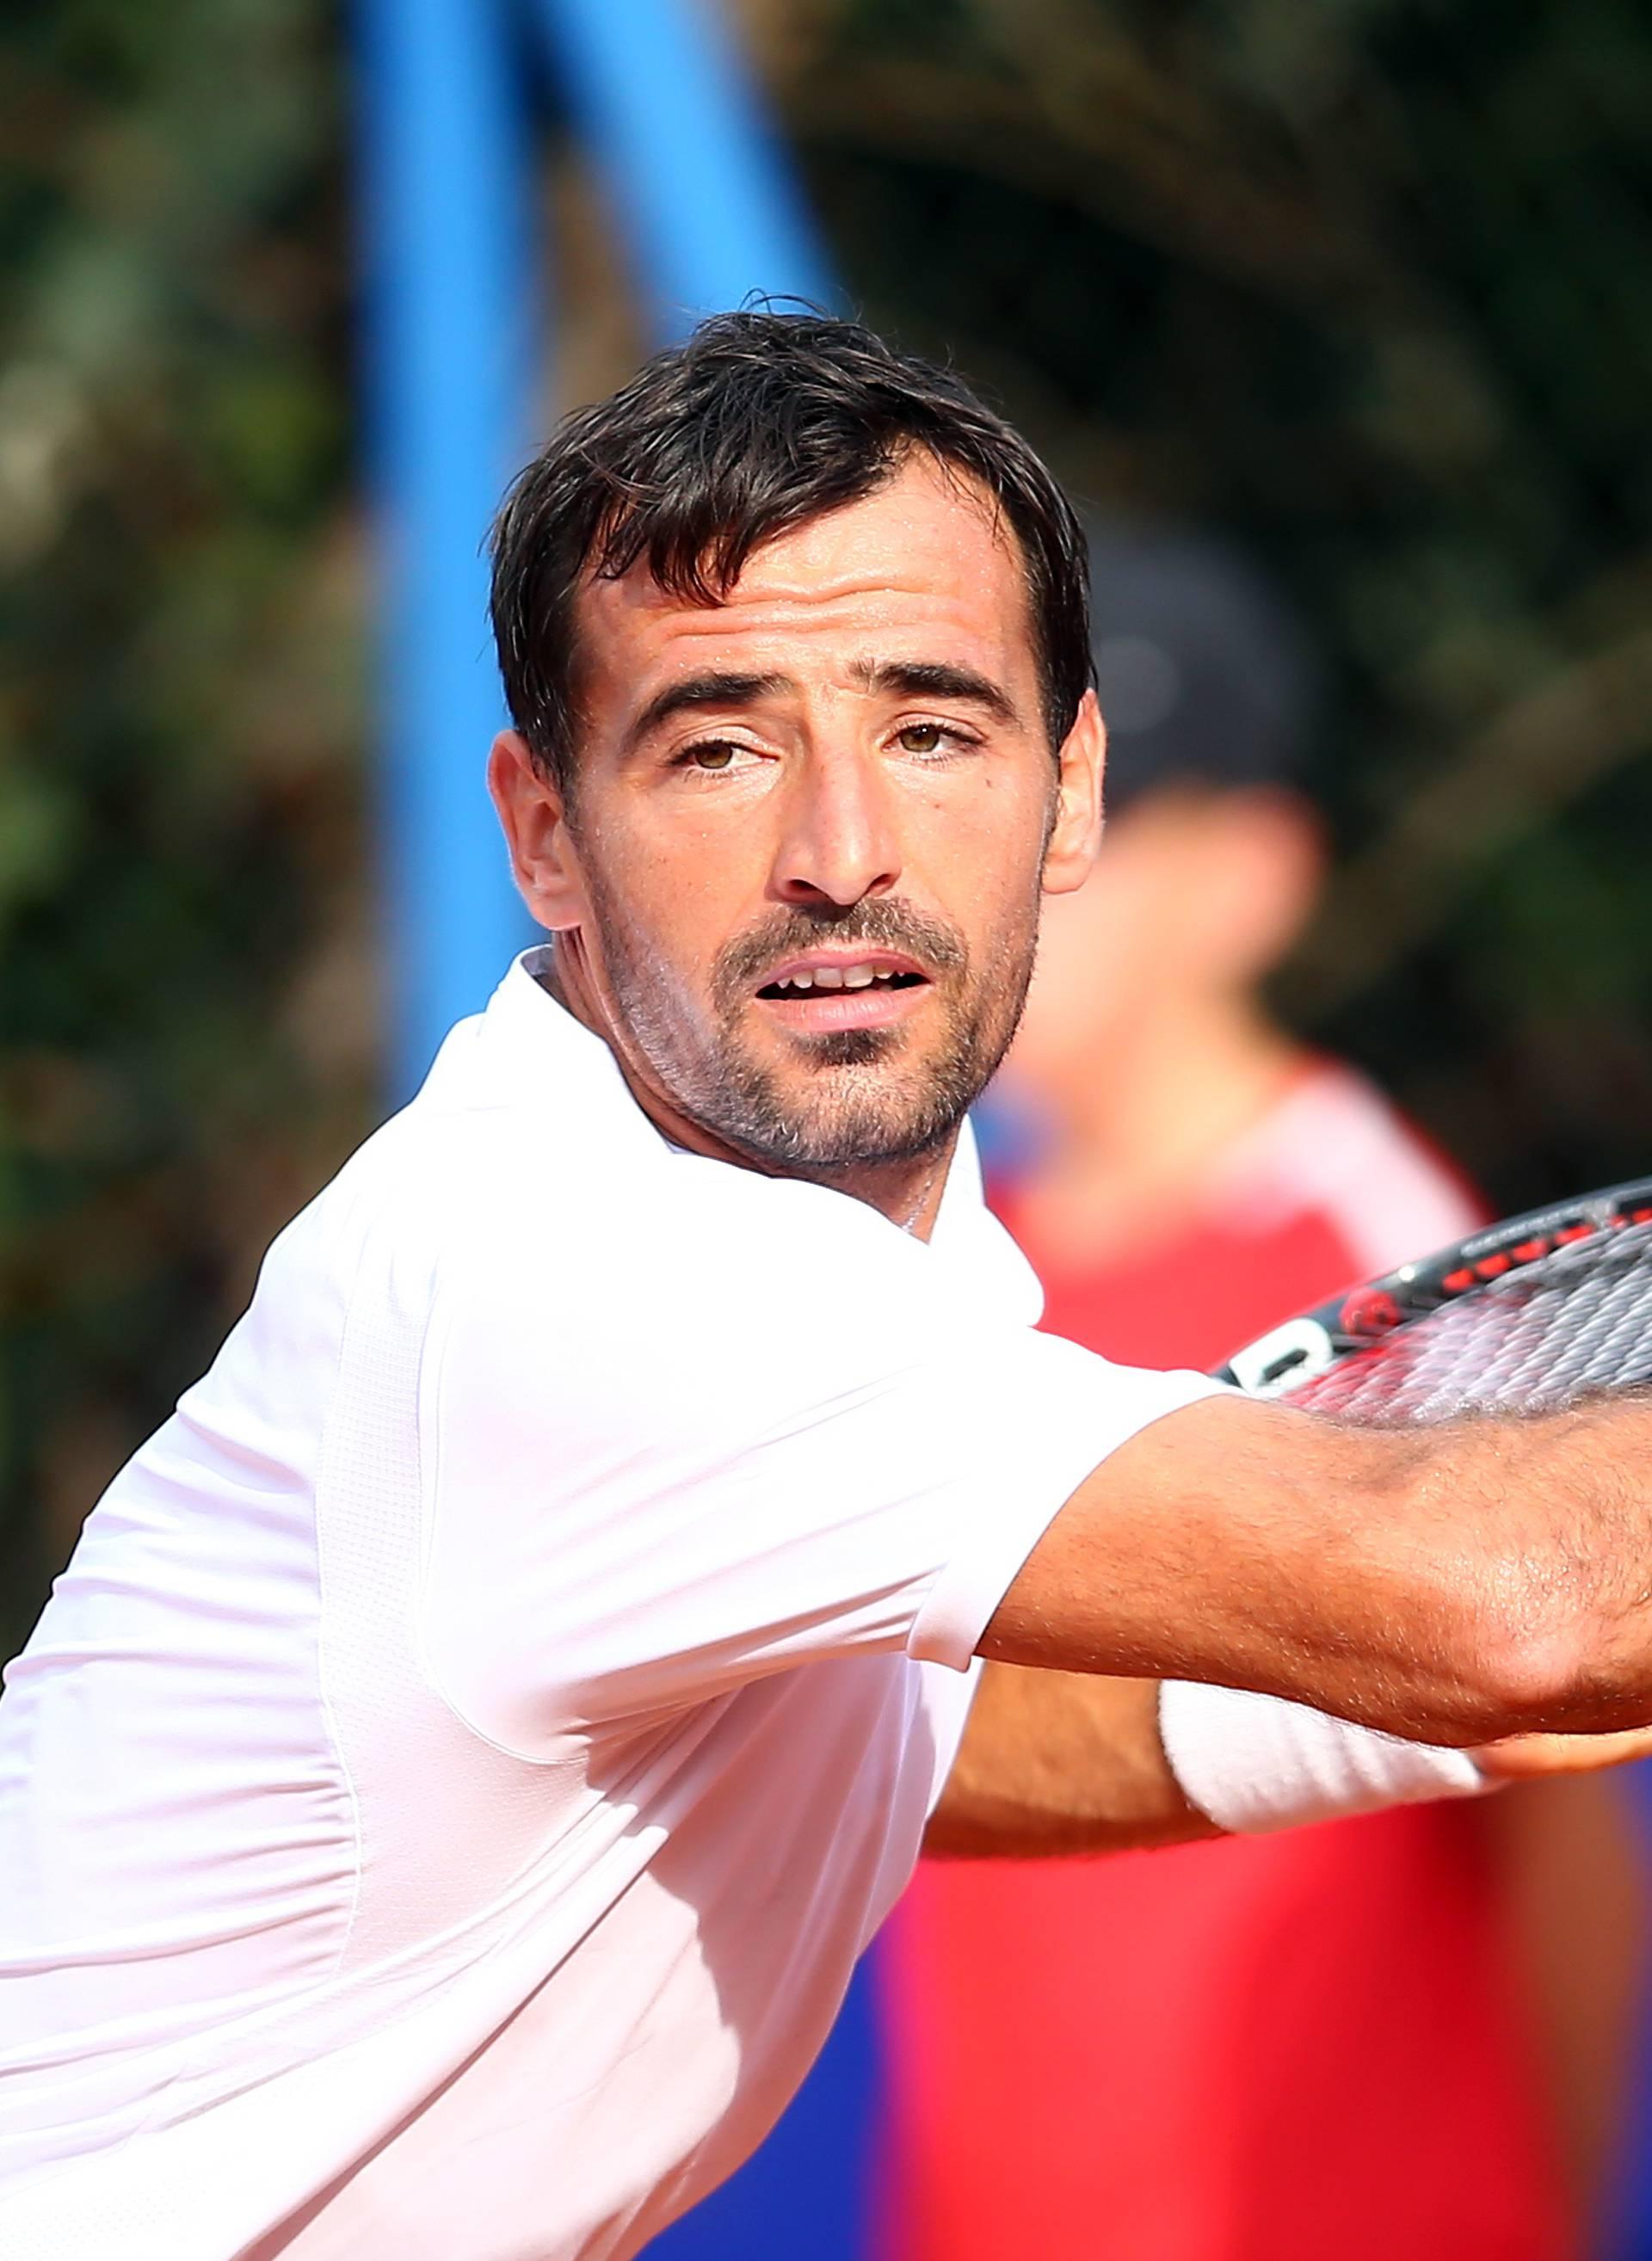 Ivan Dodig juri po novi naslov: Nakon RG-a, ide po Wimbledon